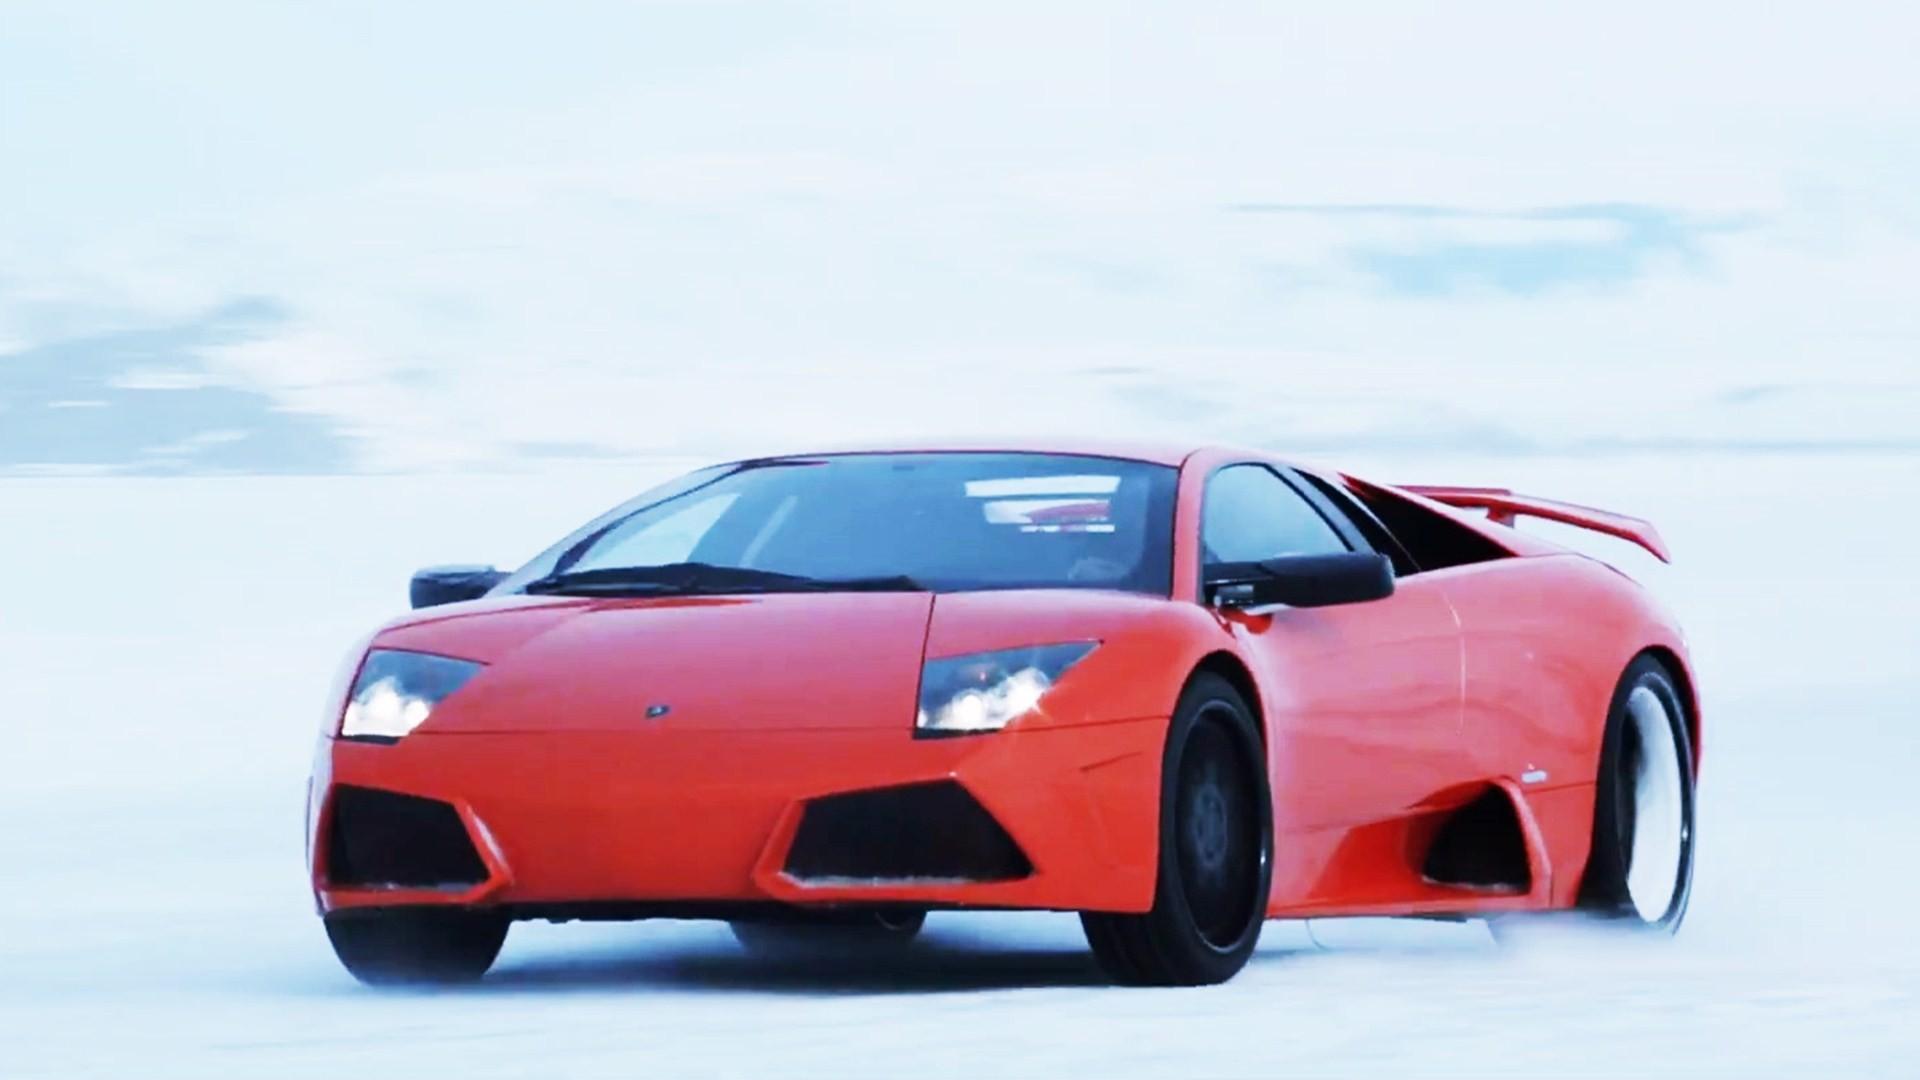 Top Fate-and-Furious-8-Cars Fast-&-Furious-8-Orange-Lamborghini-Wallpaper-11776  High-Definition